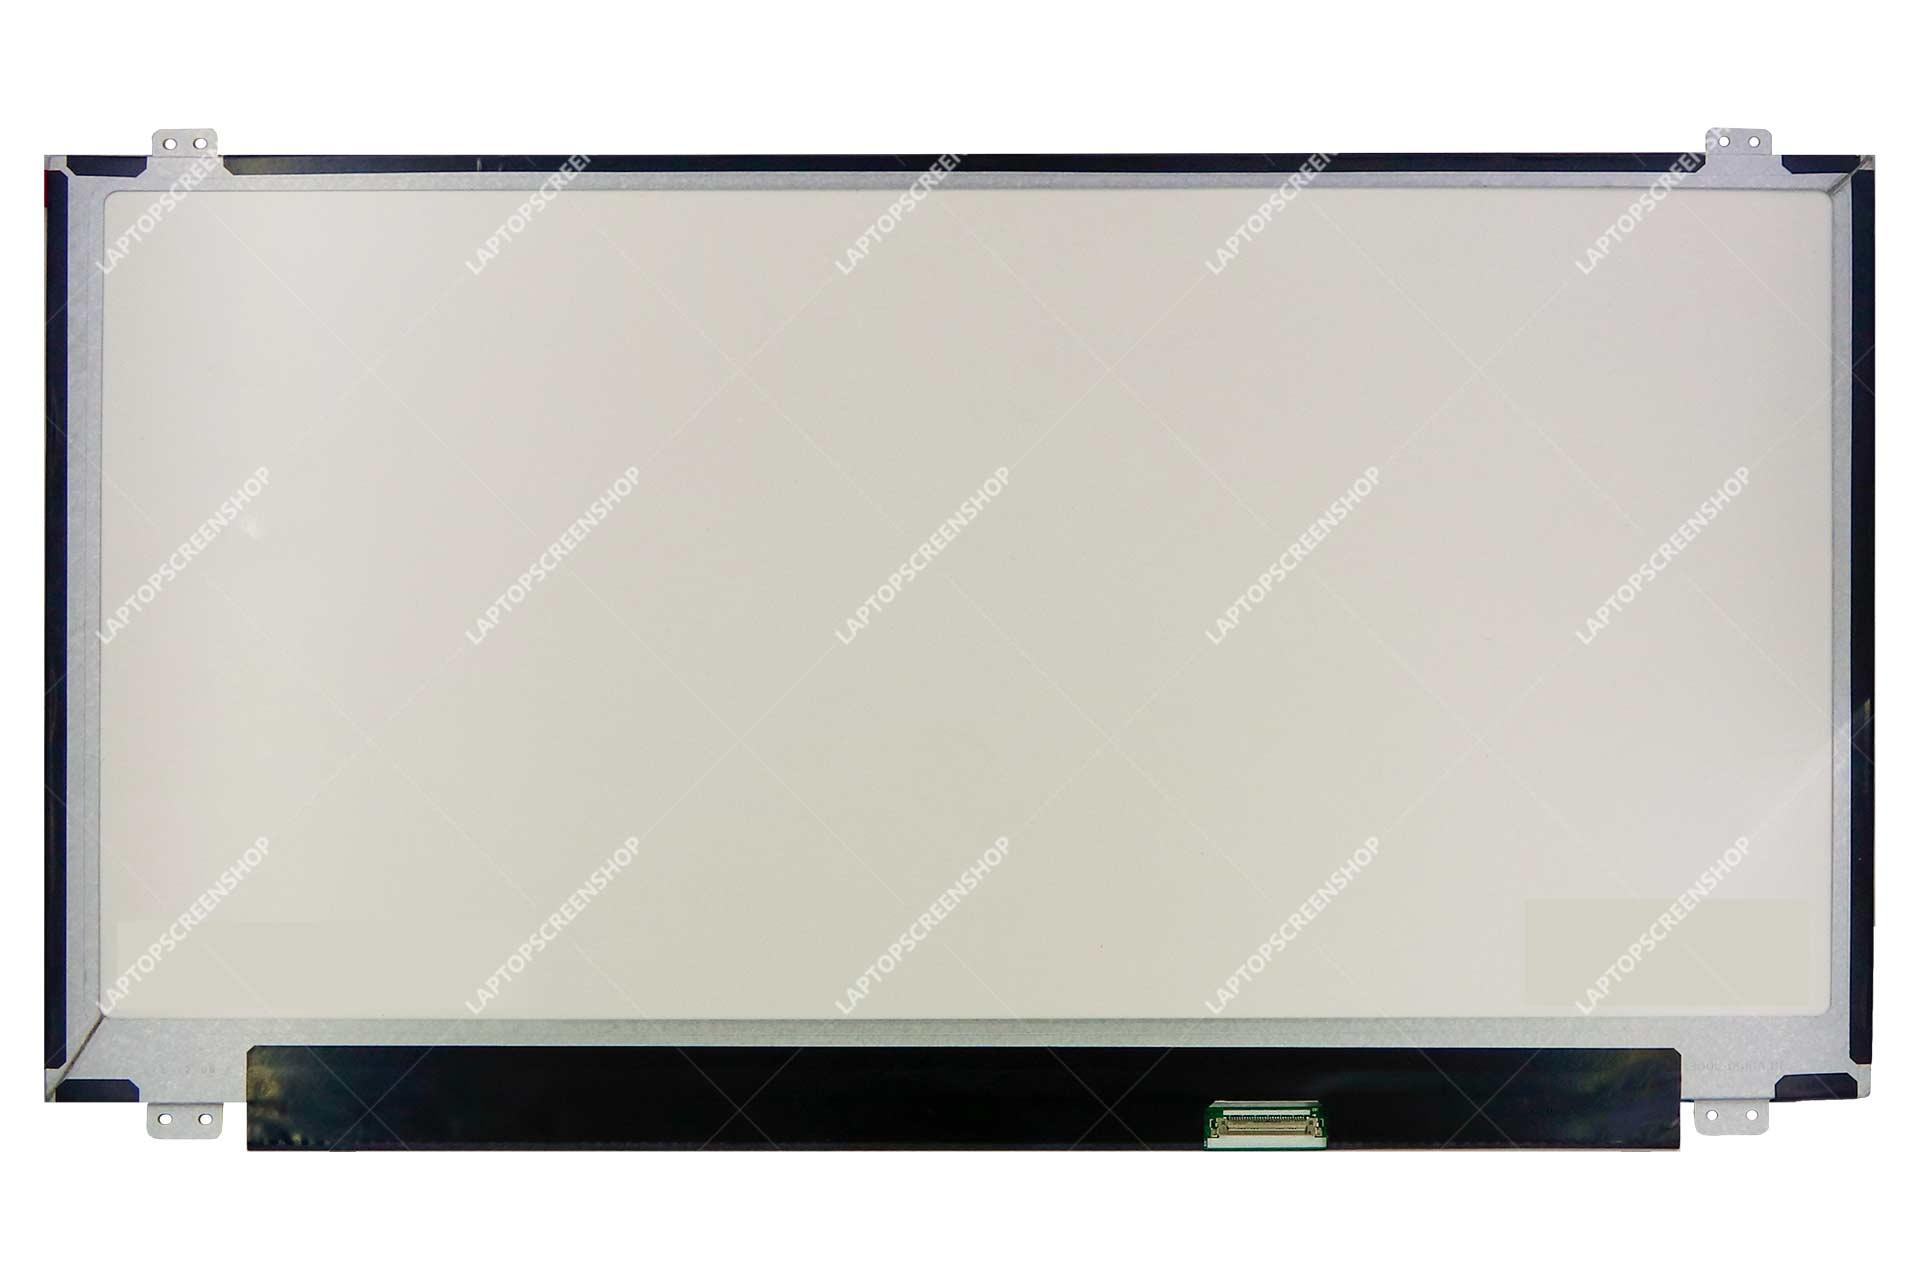 ACER-ASPIRE-E1-510-2410-LCD |HD|فروشگاه لپ تاپ اسکرين | تعمير لپ تاپ